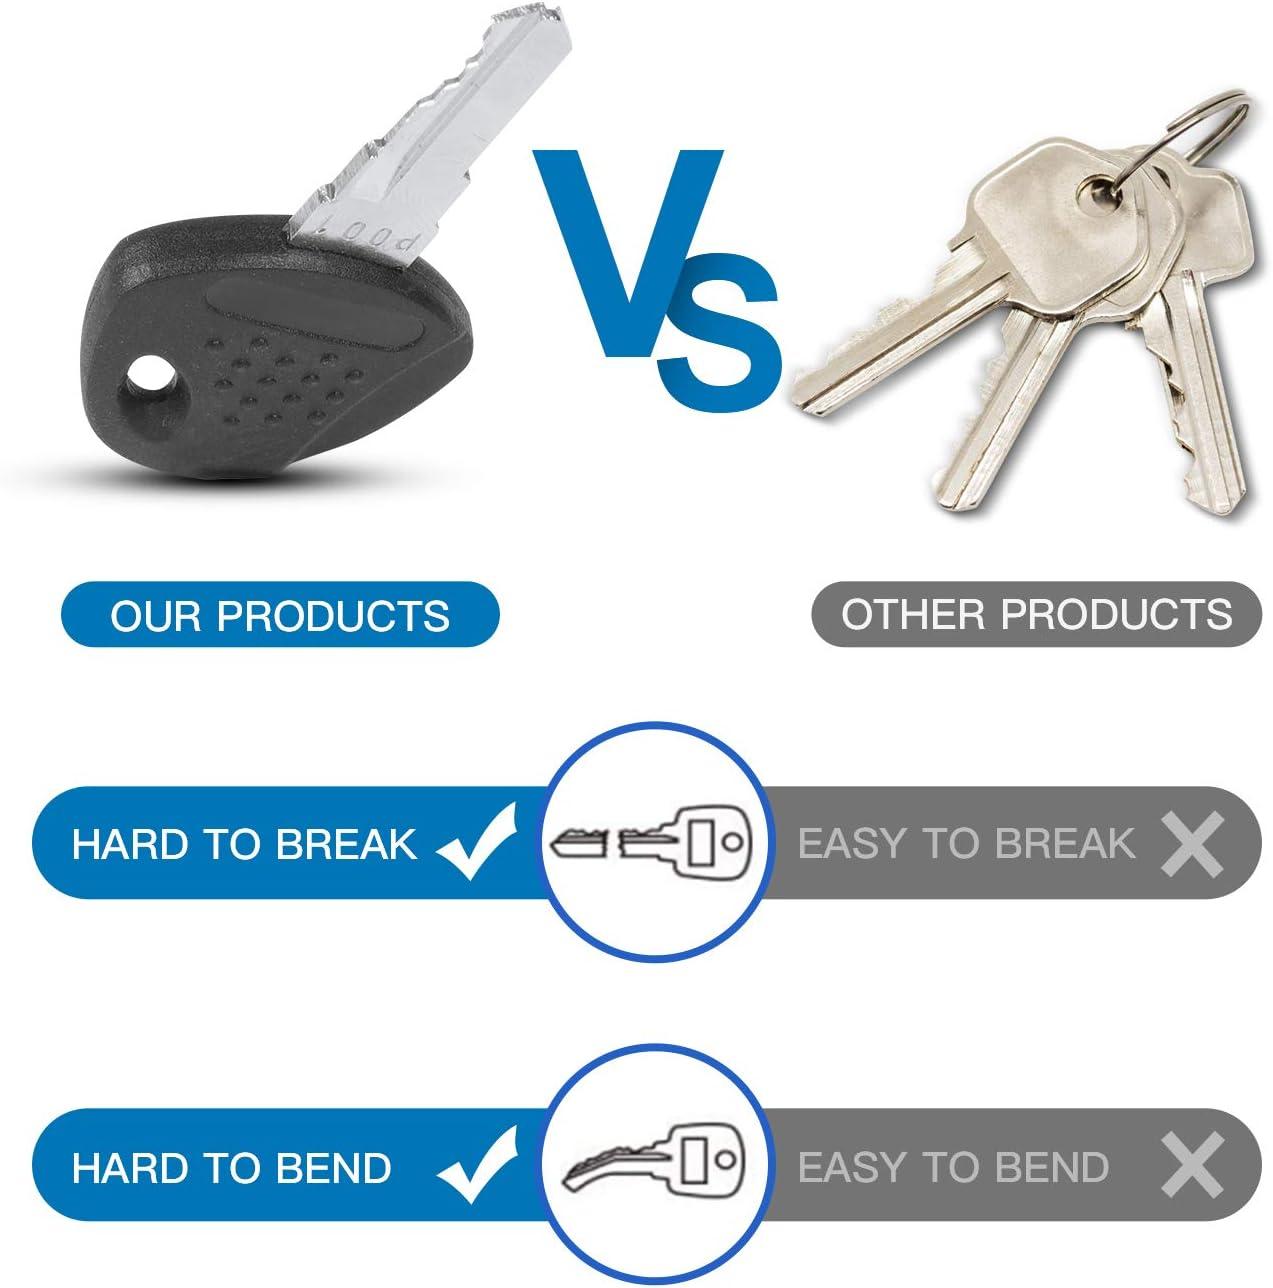 1//4 Diameter Fits 1 to 3 Coupler Span Adjustable Span Trailer Coupler Lock METOWARE Swivel Head Trailer Coupler Lock